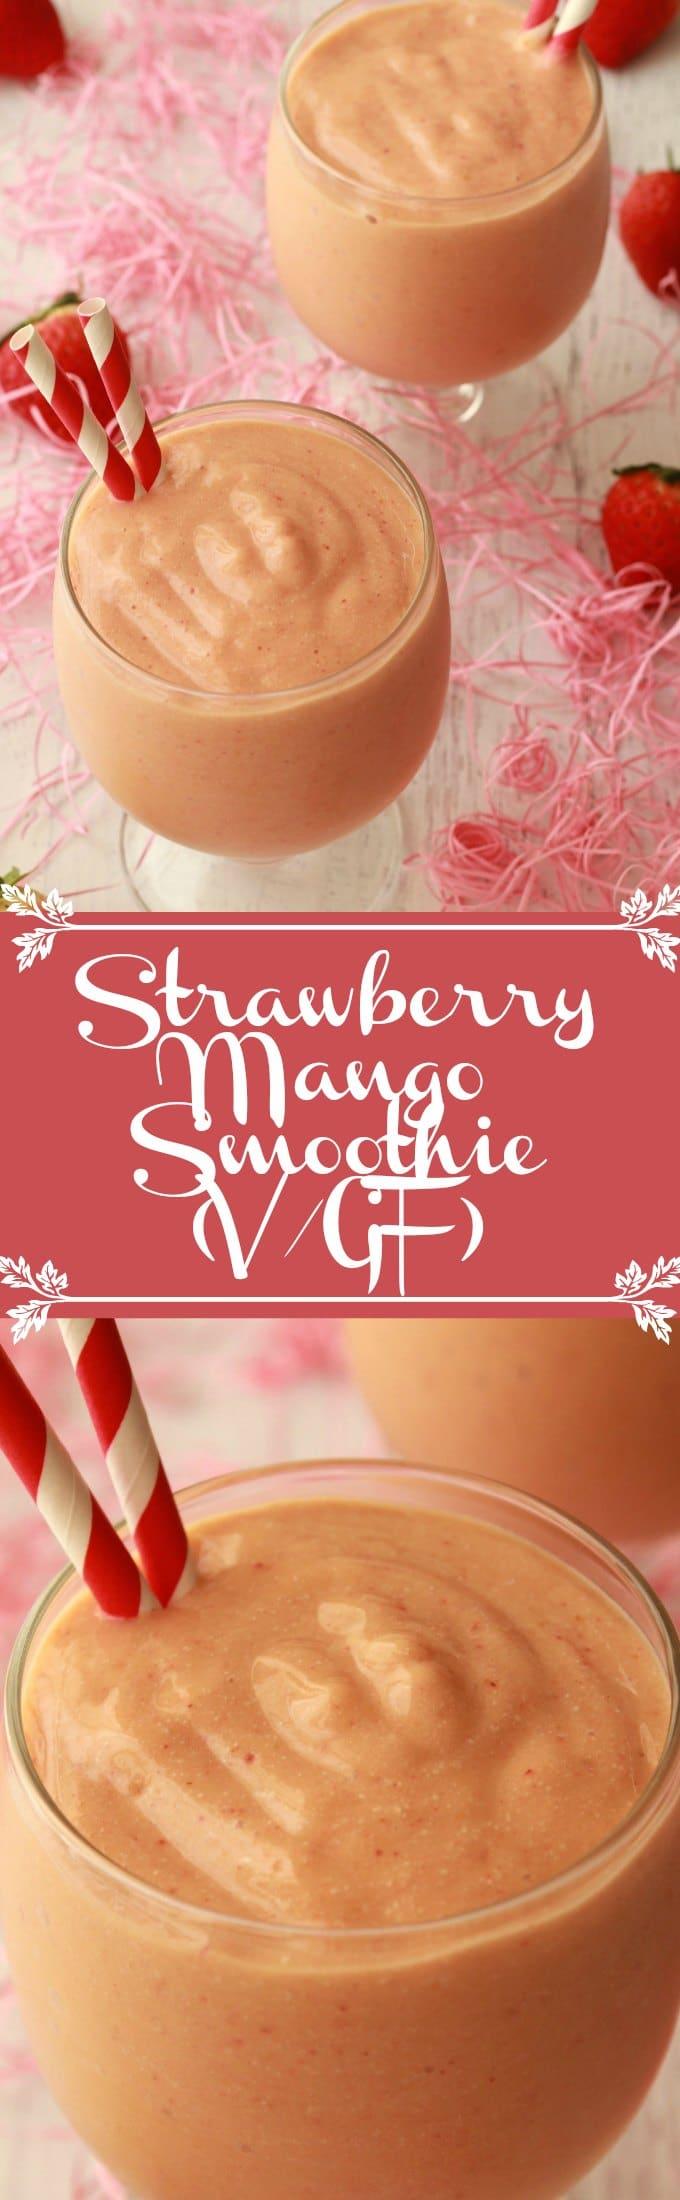 Deliciously creamy Strawberry Mango Smoothie. Perfect for a healthy vegan breakfast! #vegan #lovingitvegan #glutenfree #dairyfree #strawberrymango #smoothies